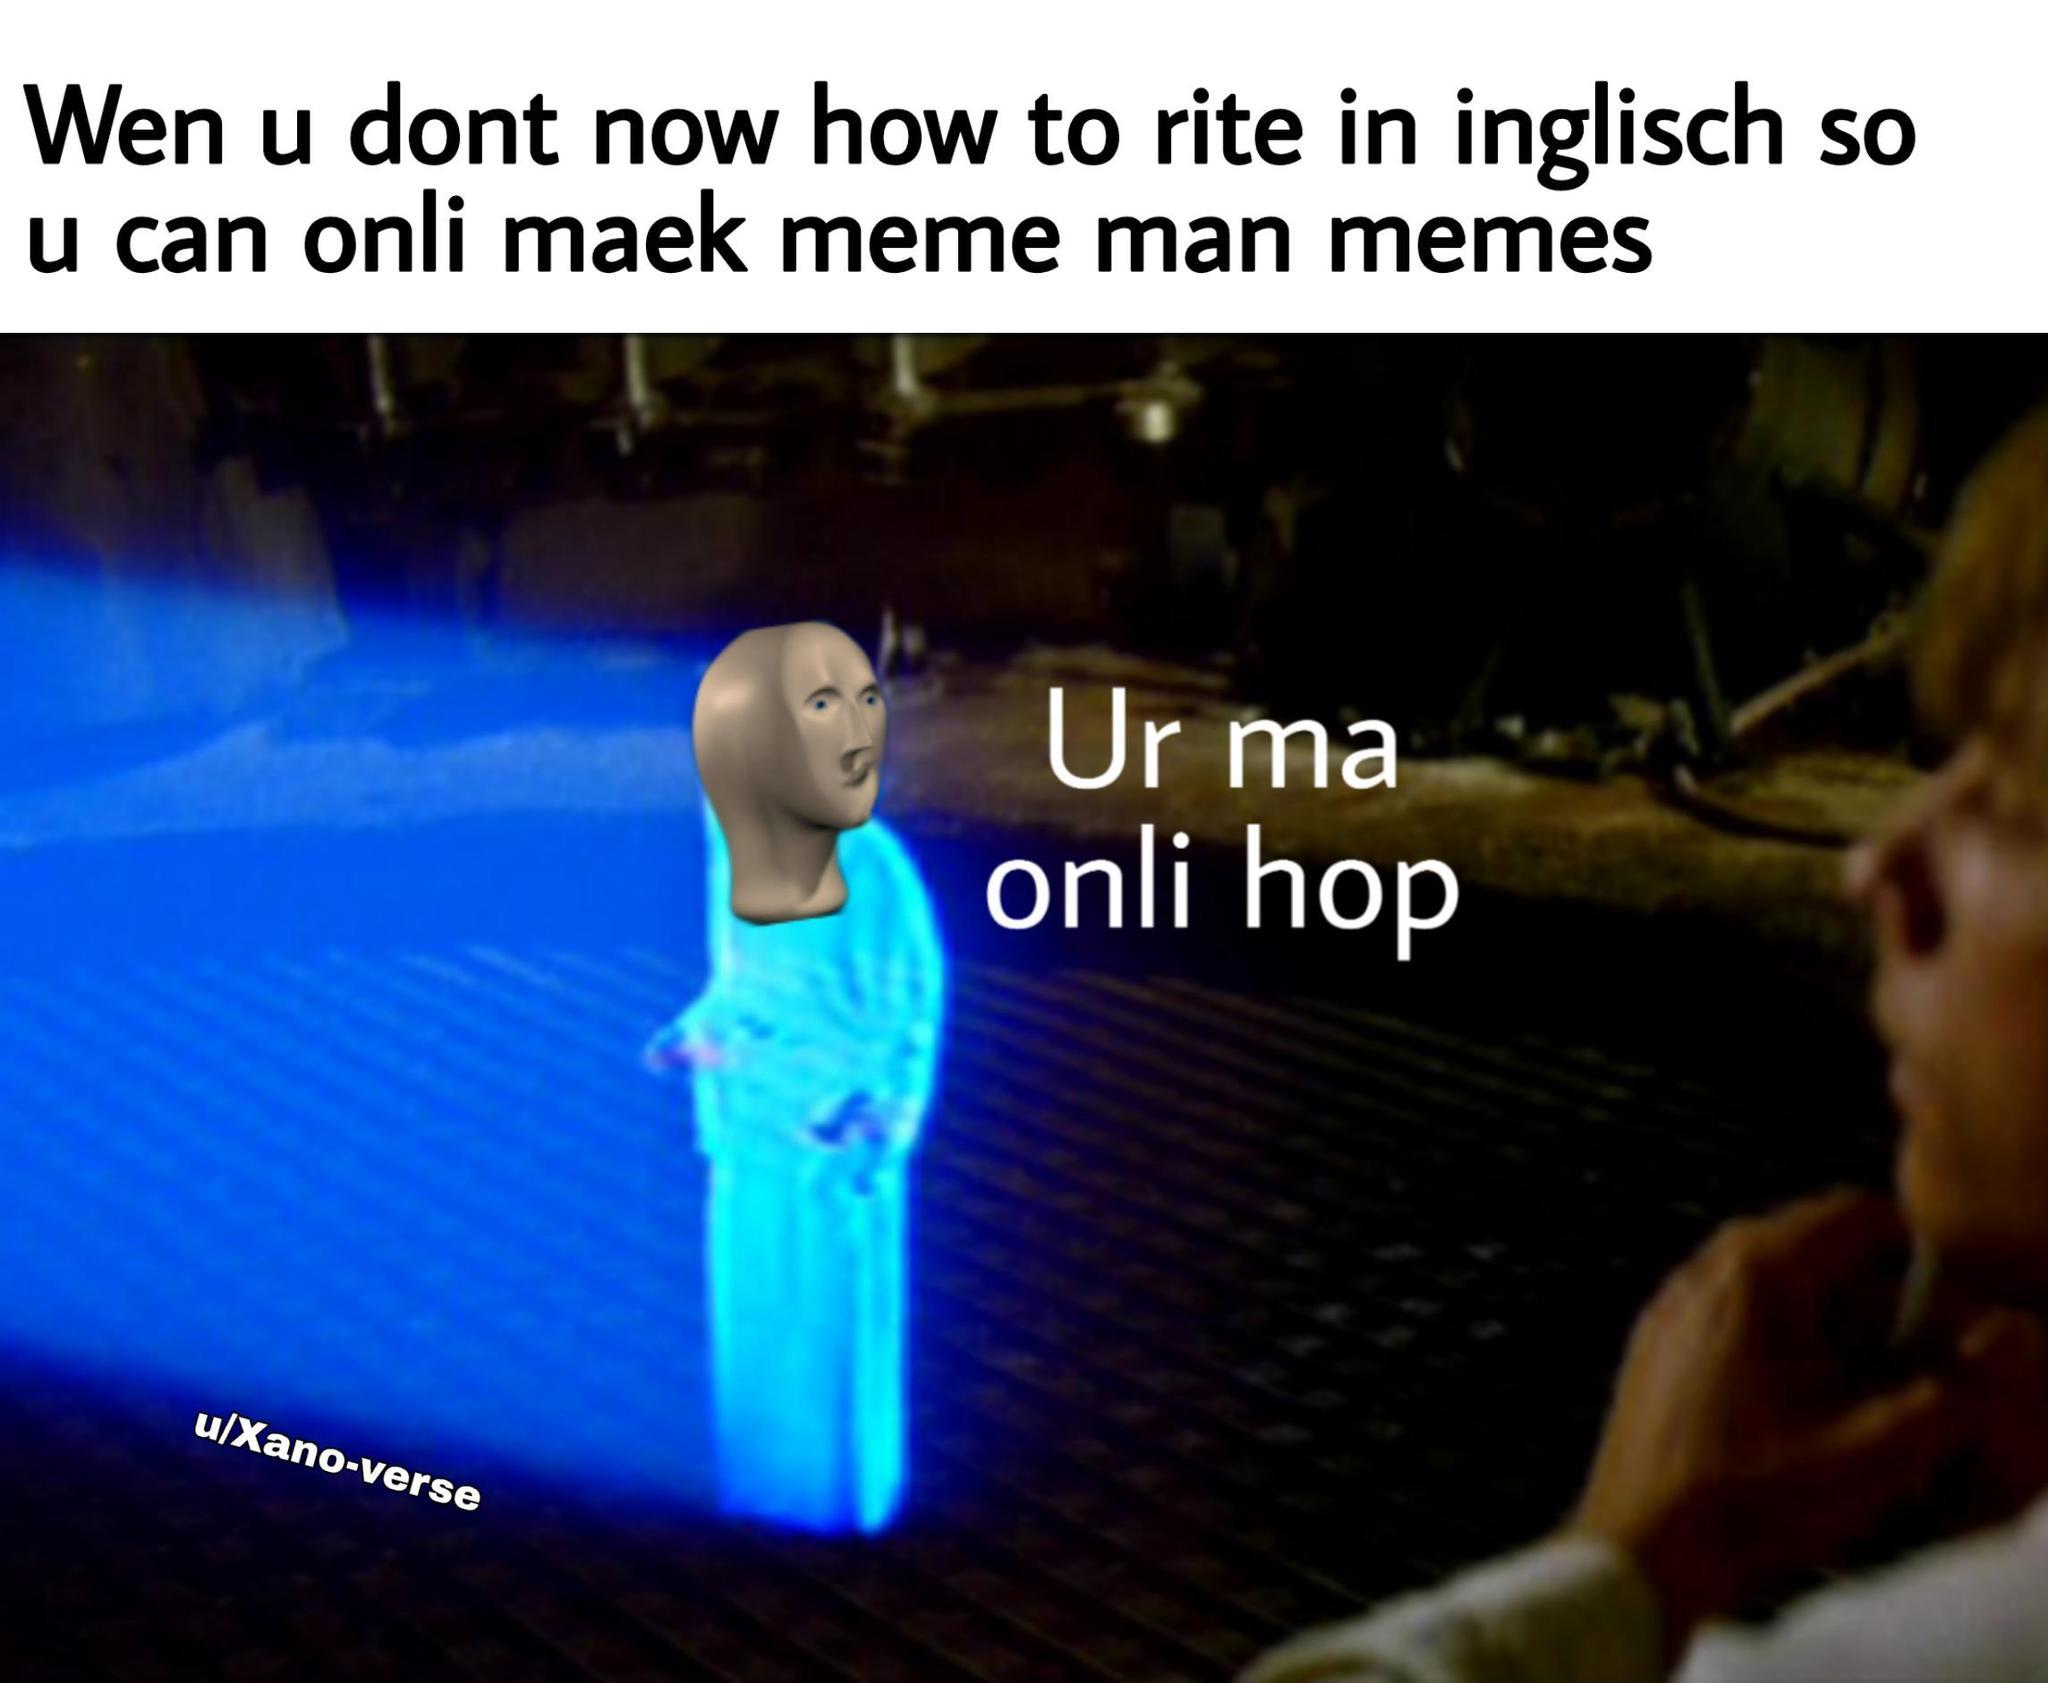 halp ma - meme